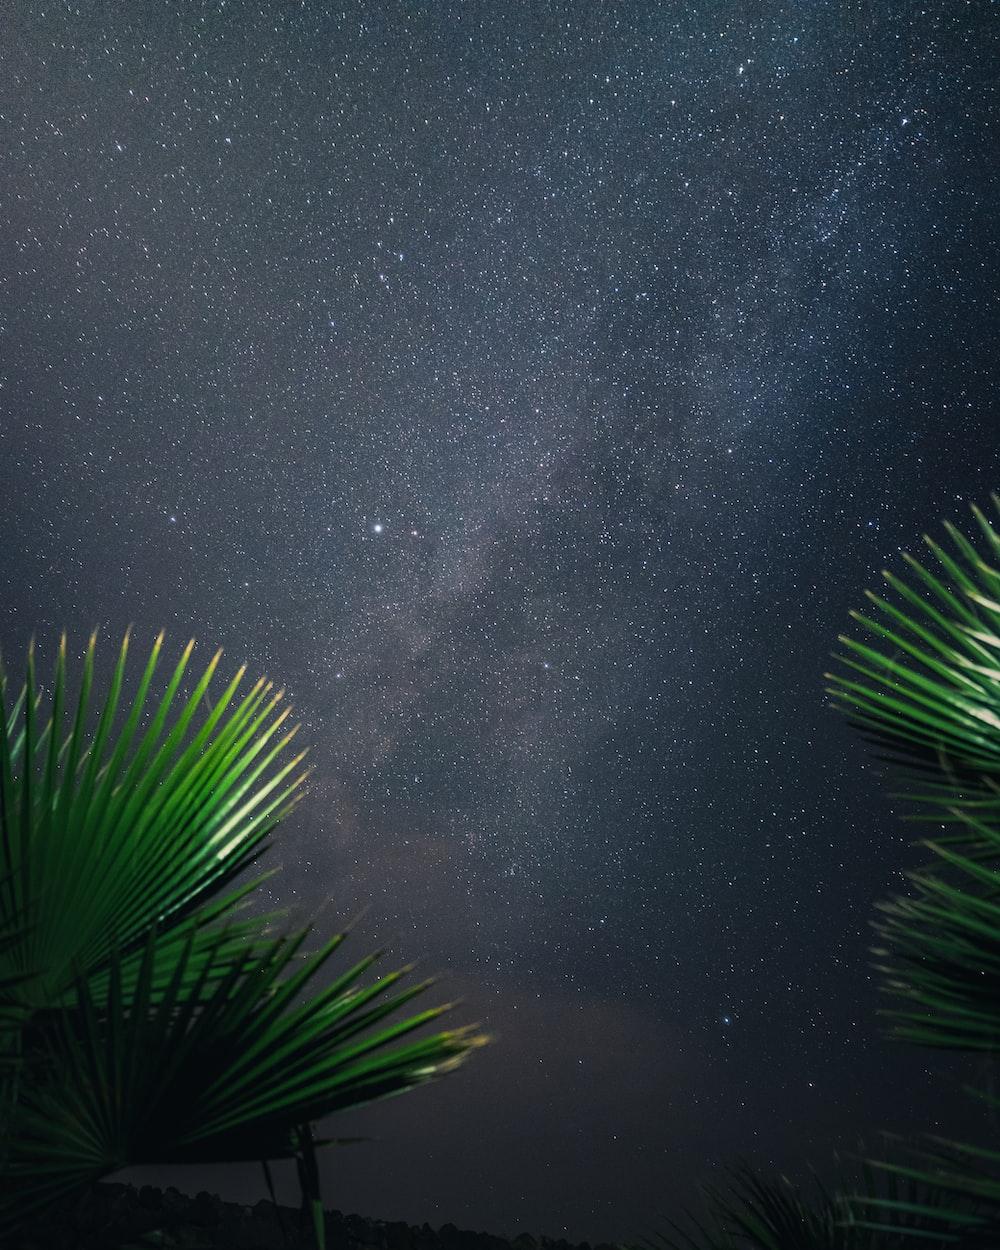 green leaf tree under black sky during nighttime